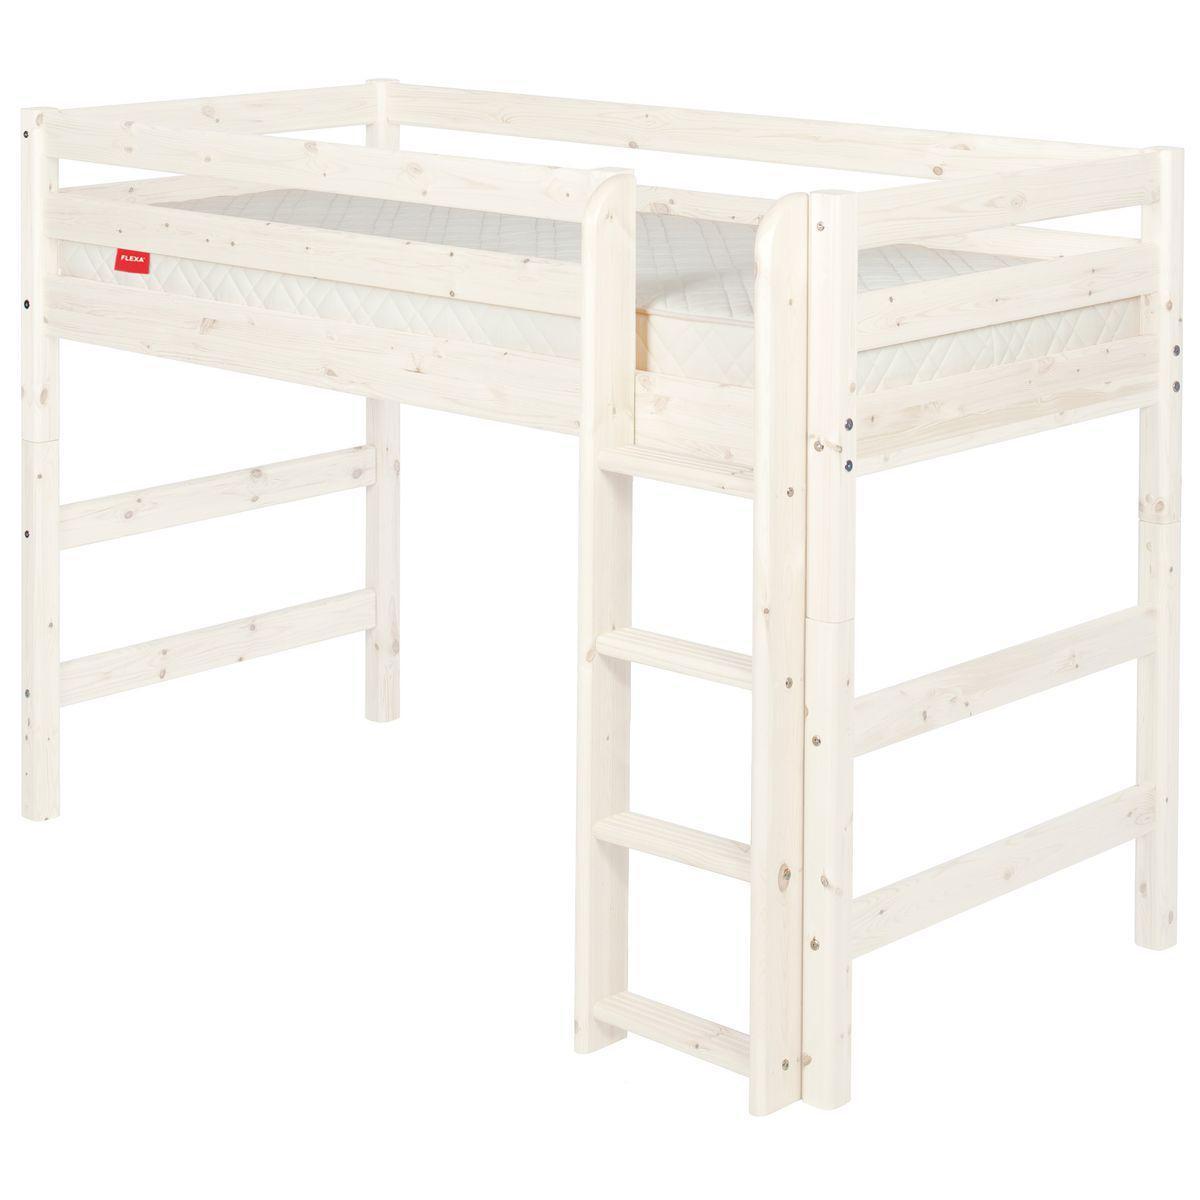 Halbhohes Bett 90x200 cm + gerade Leiter CLASSIC by Flexa whitewash